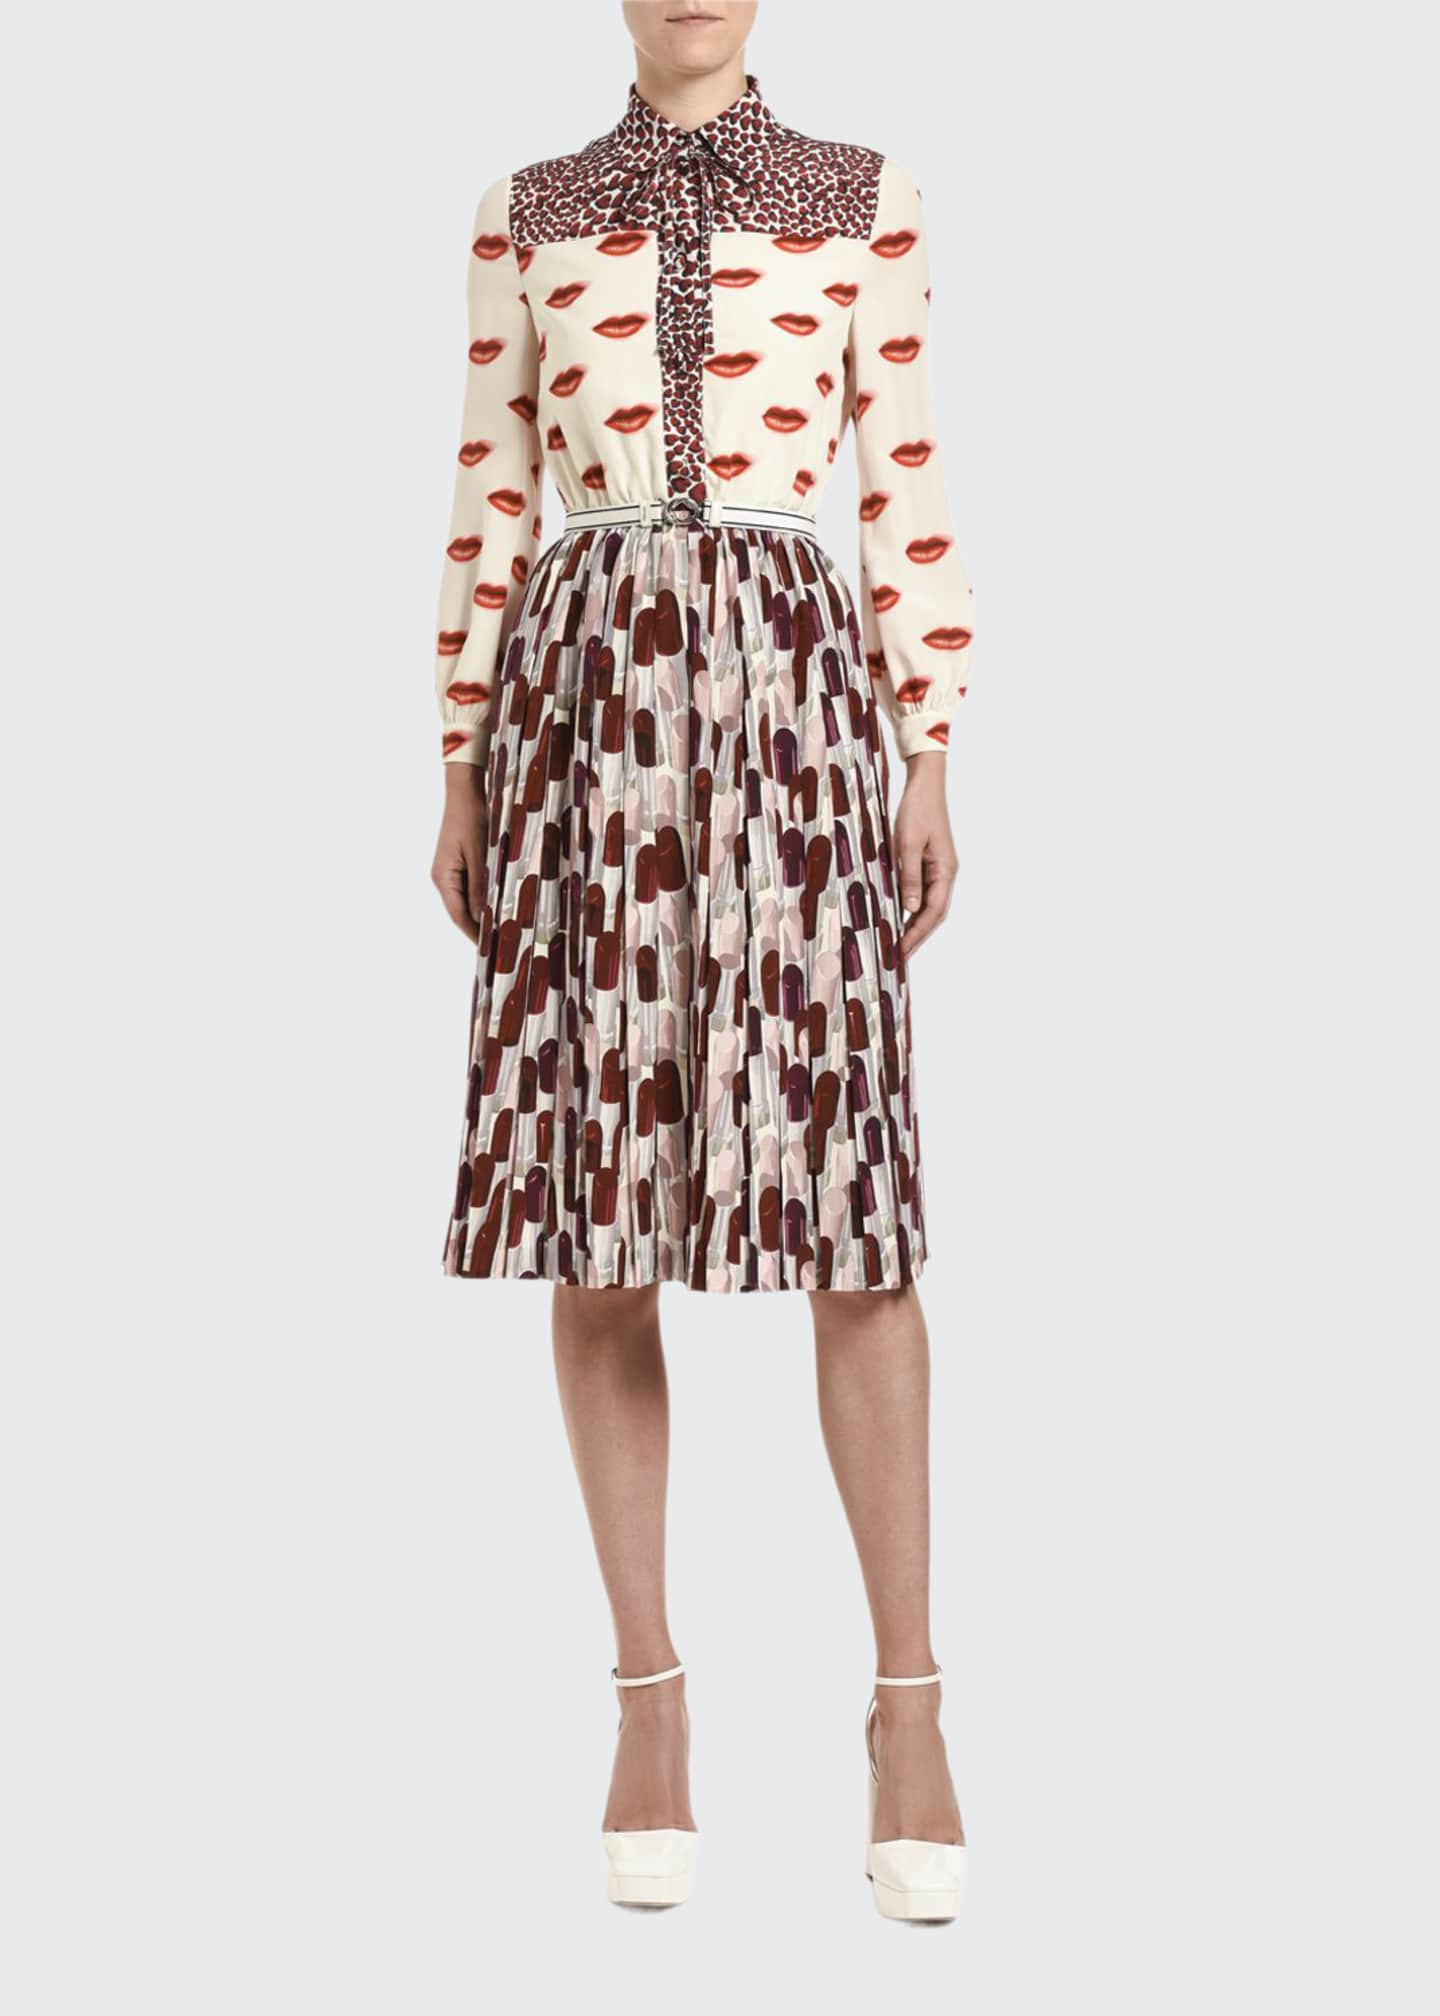 Prada Lipstick & Animal-Print Crepe Bow-Neck Dress